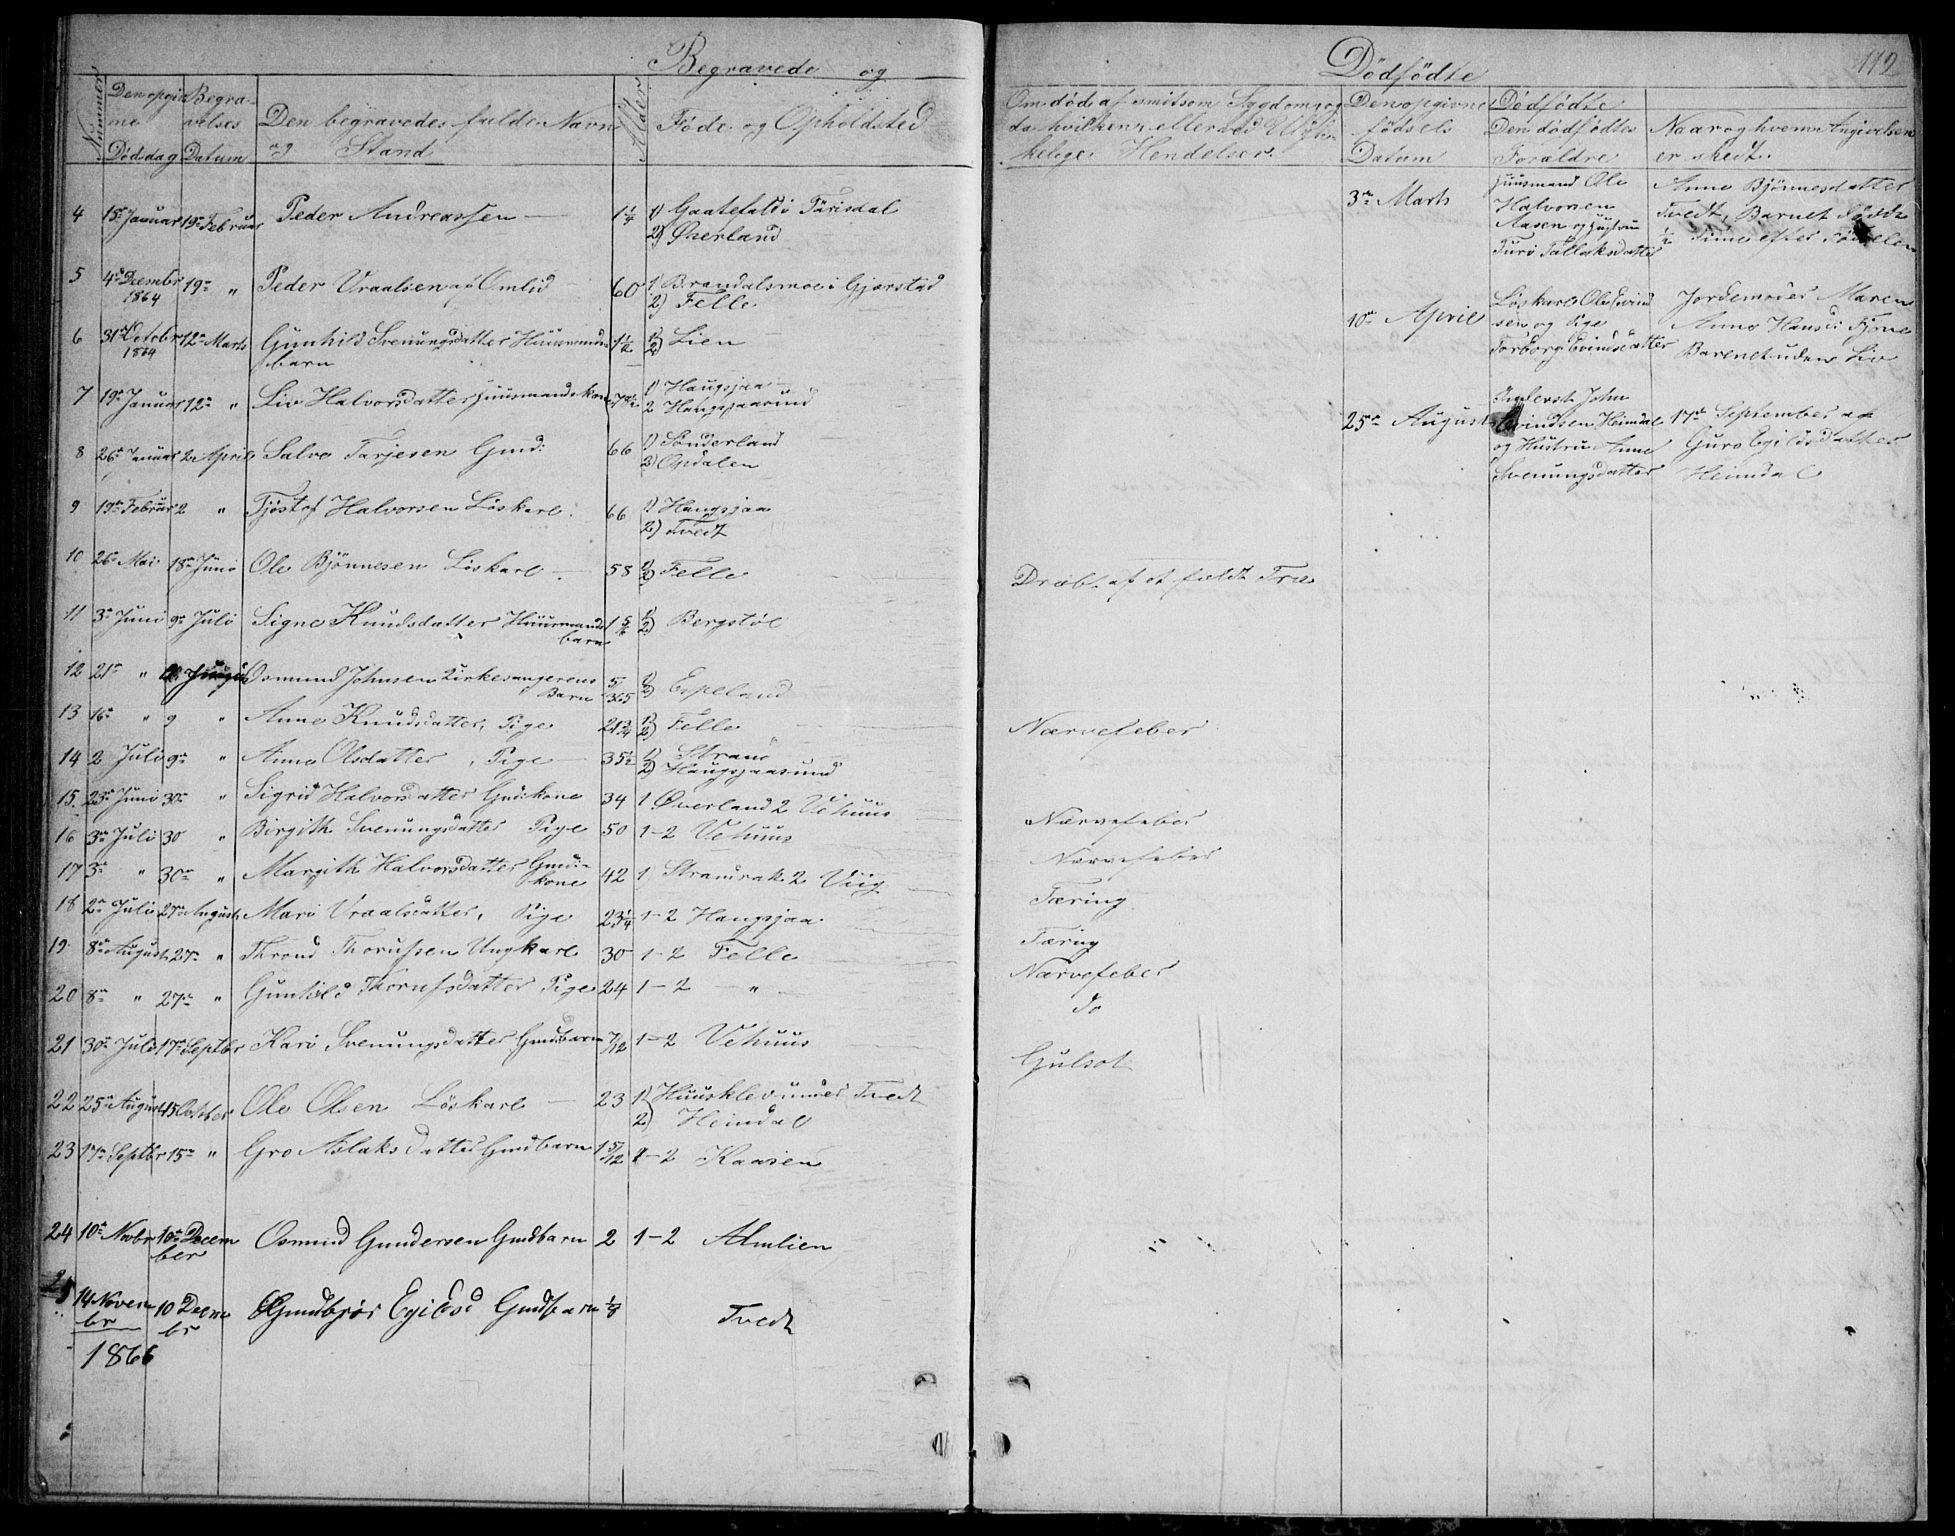 SAKO, Nissedal kirkebøker, G/Gb/L0002: Klokkerbok nr. II 2, 1863-1892, s. 112